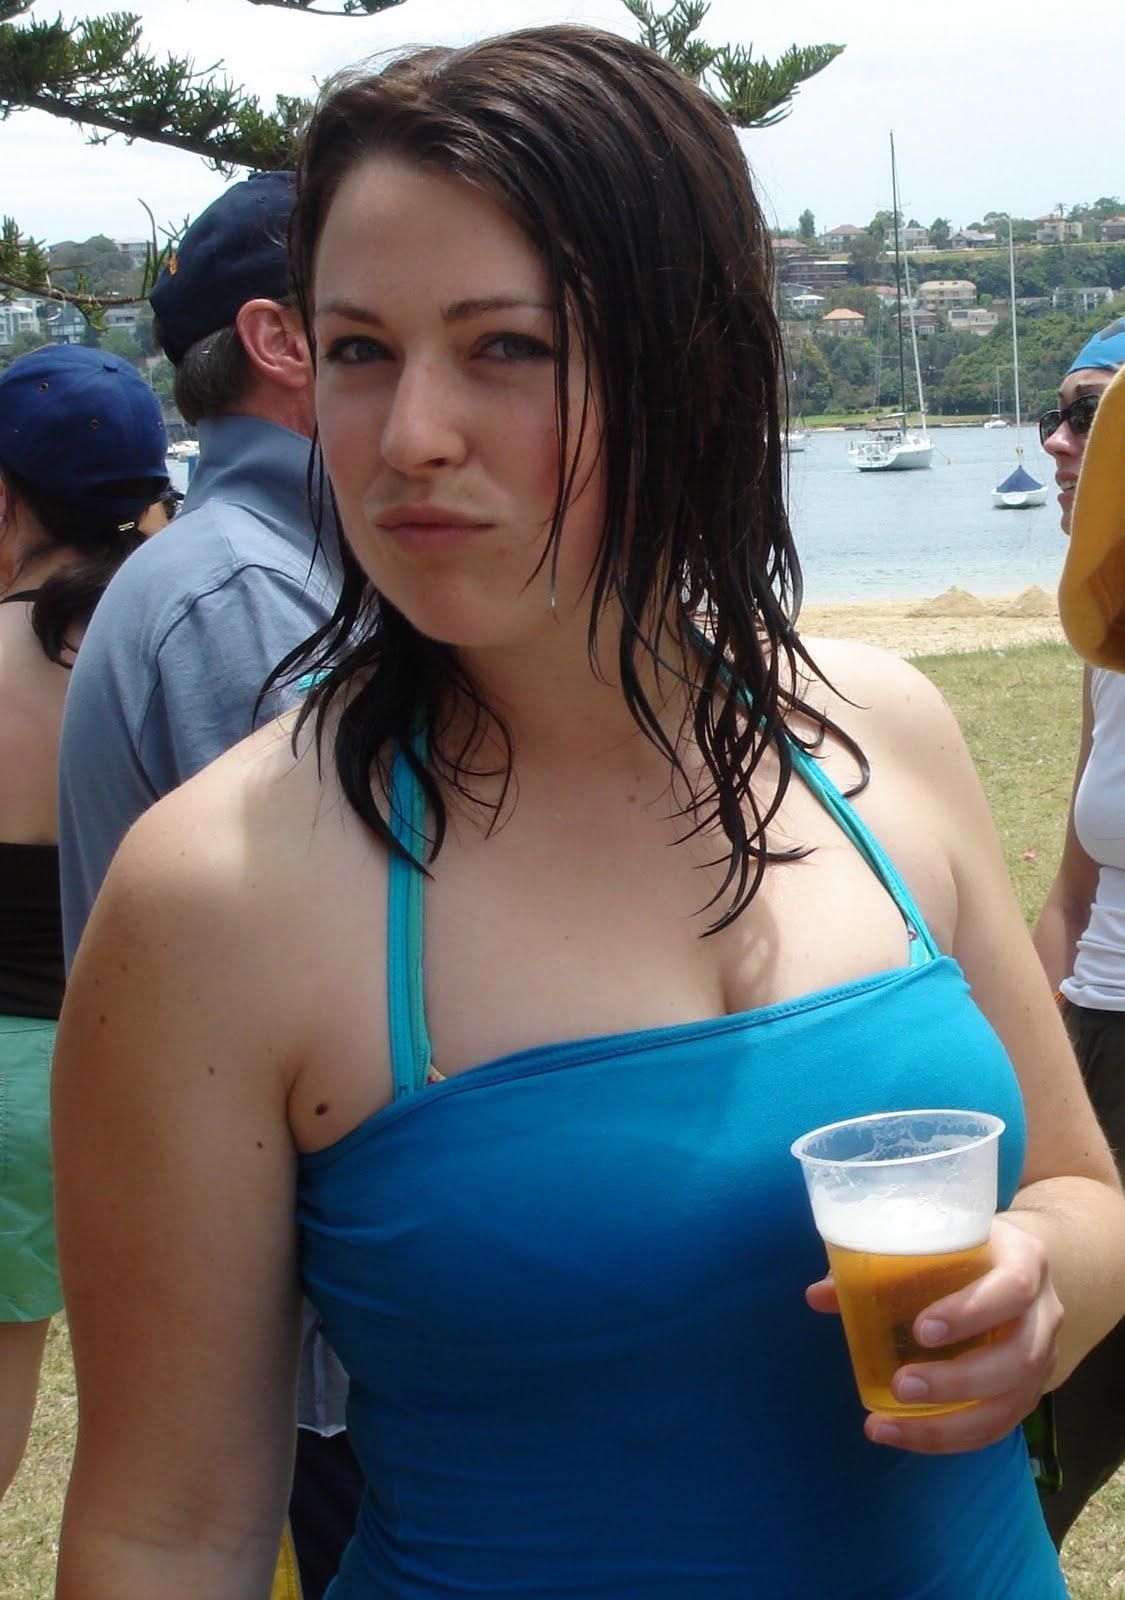 http://4.bp.blogspot.com/-jdNuogrrg5M/Tj8pqY1M90I/AAAAAAAACG8/ZSnsrPt1ZUY/s1600/Sydney+076+-+Copy.jpg